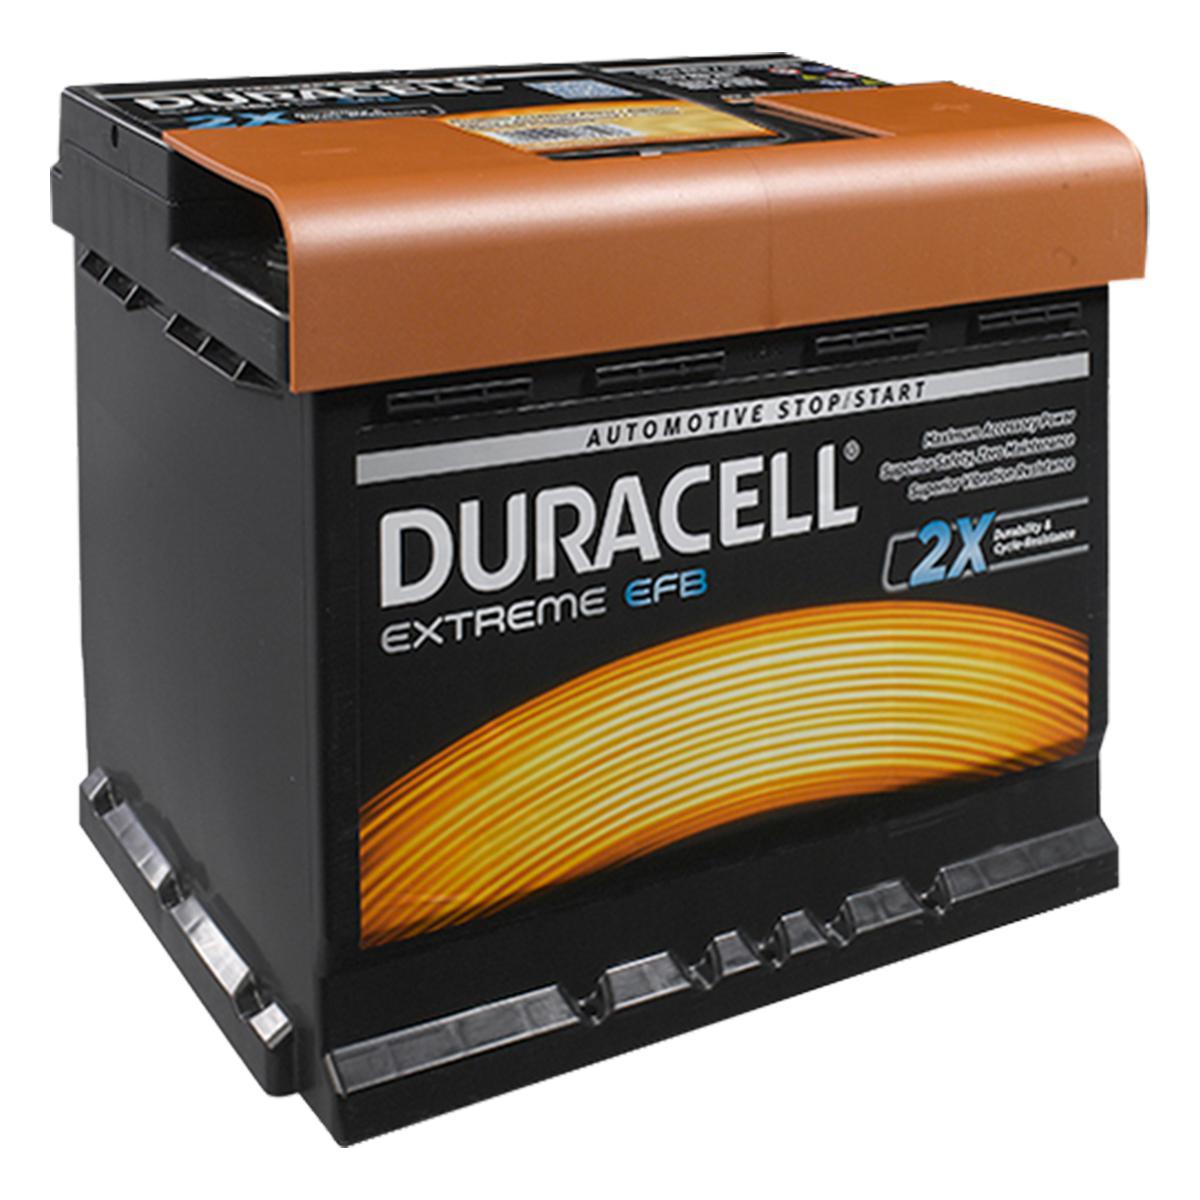 Duracell 027 / DE60 EFB Extreme Car Battery